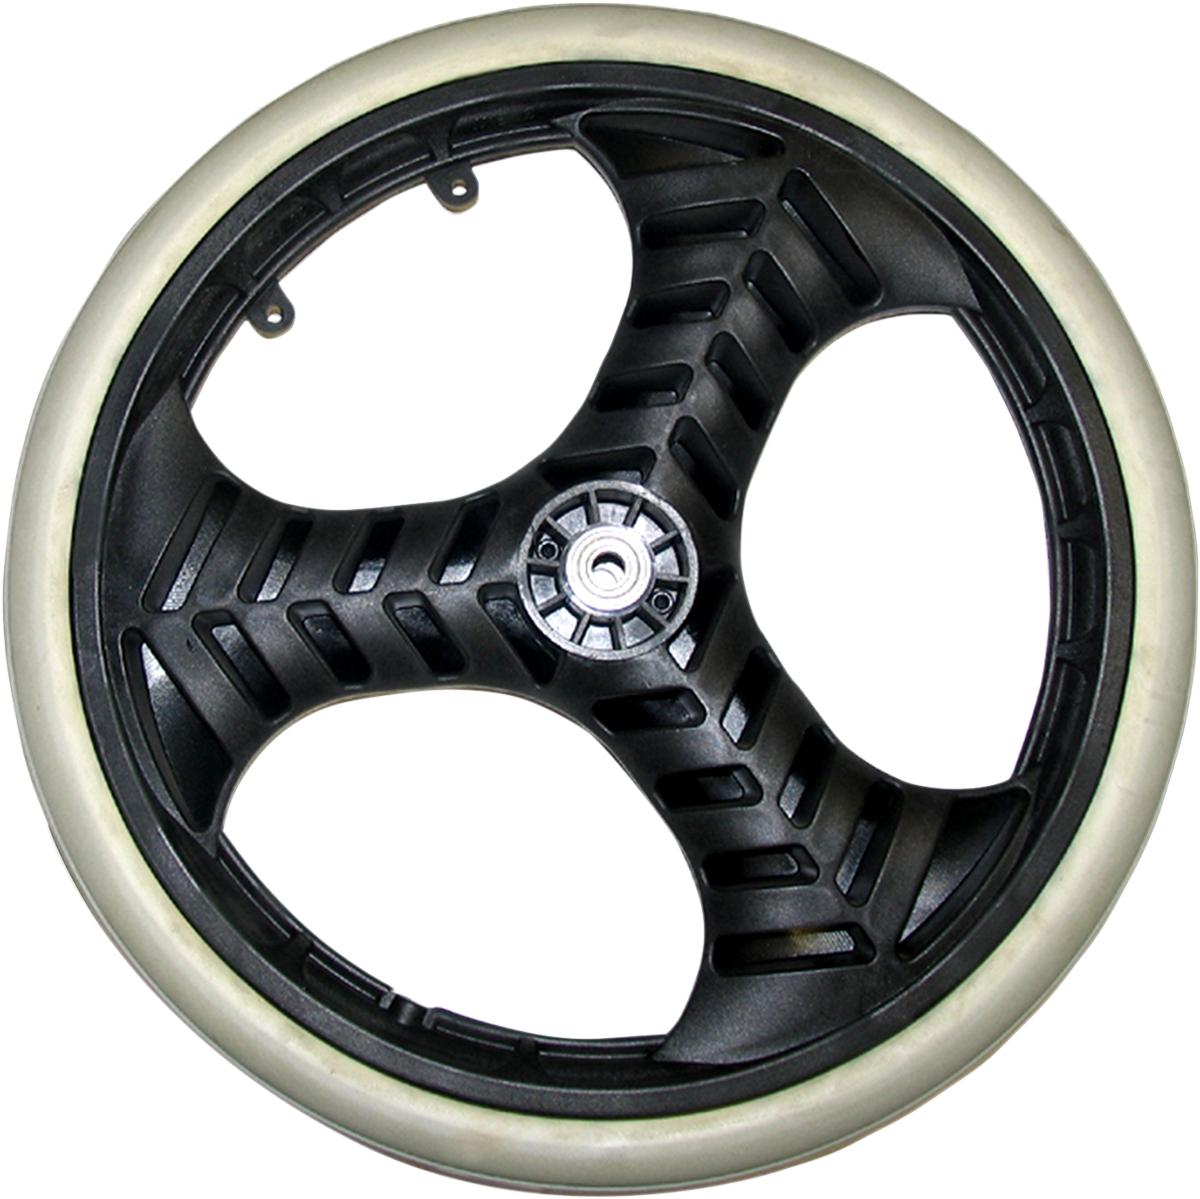 SNO Stuff Wheel Assembly